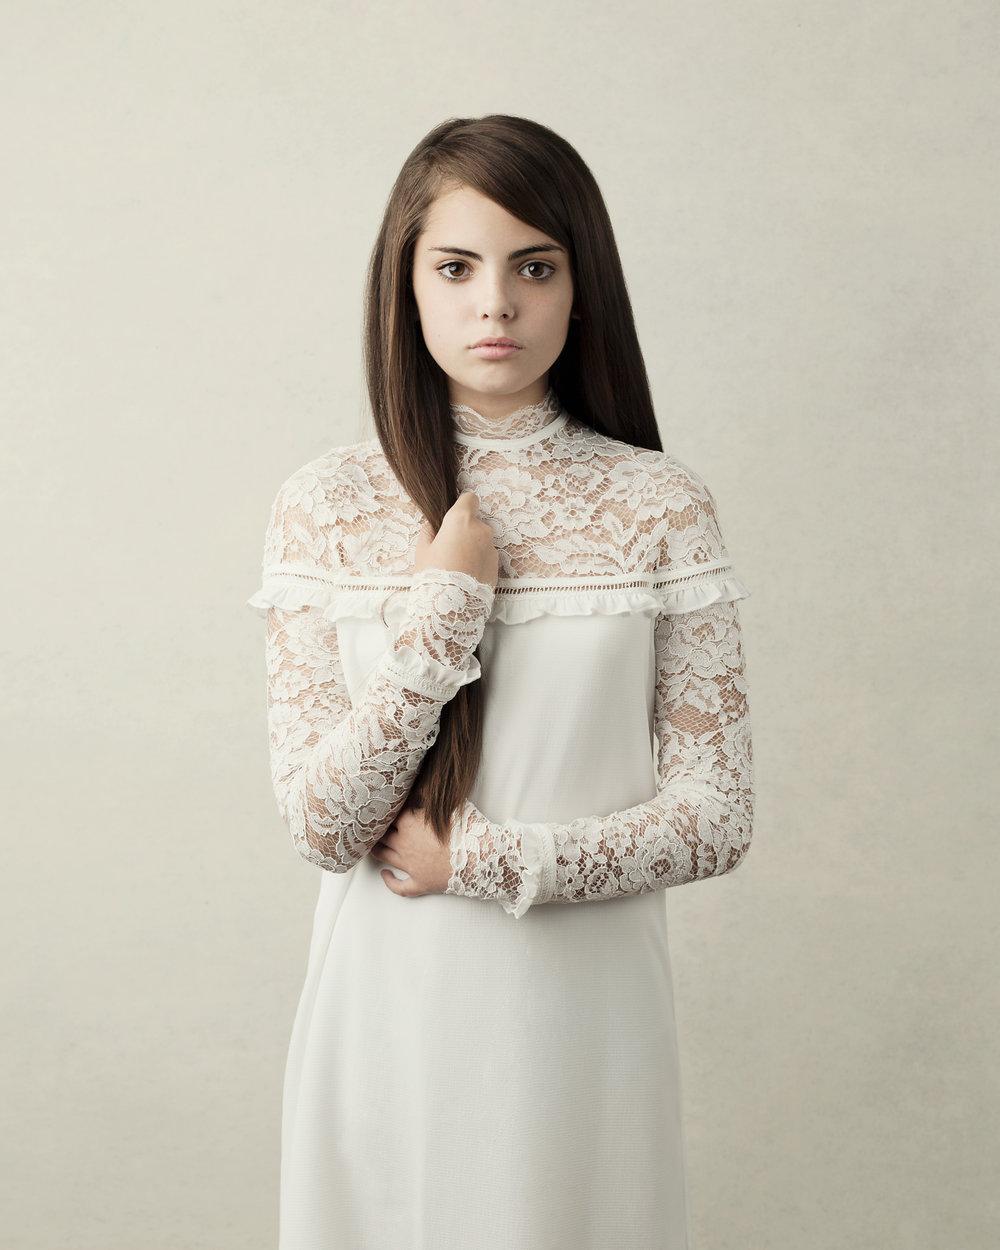 Isabella holding hair